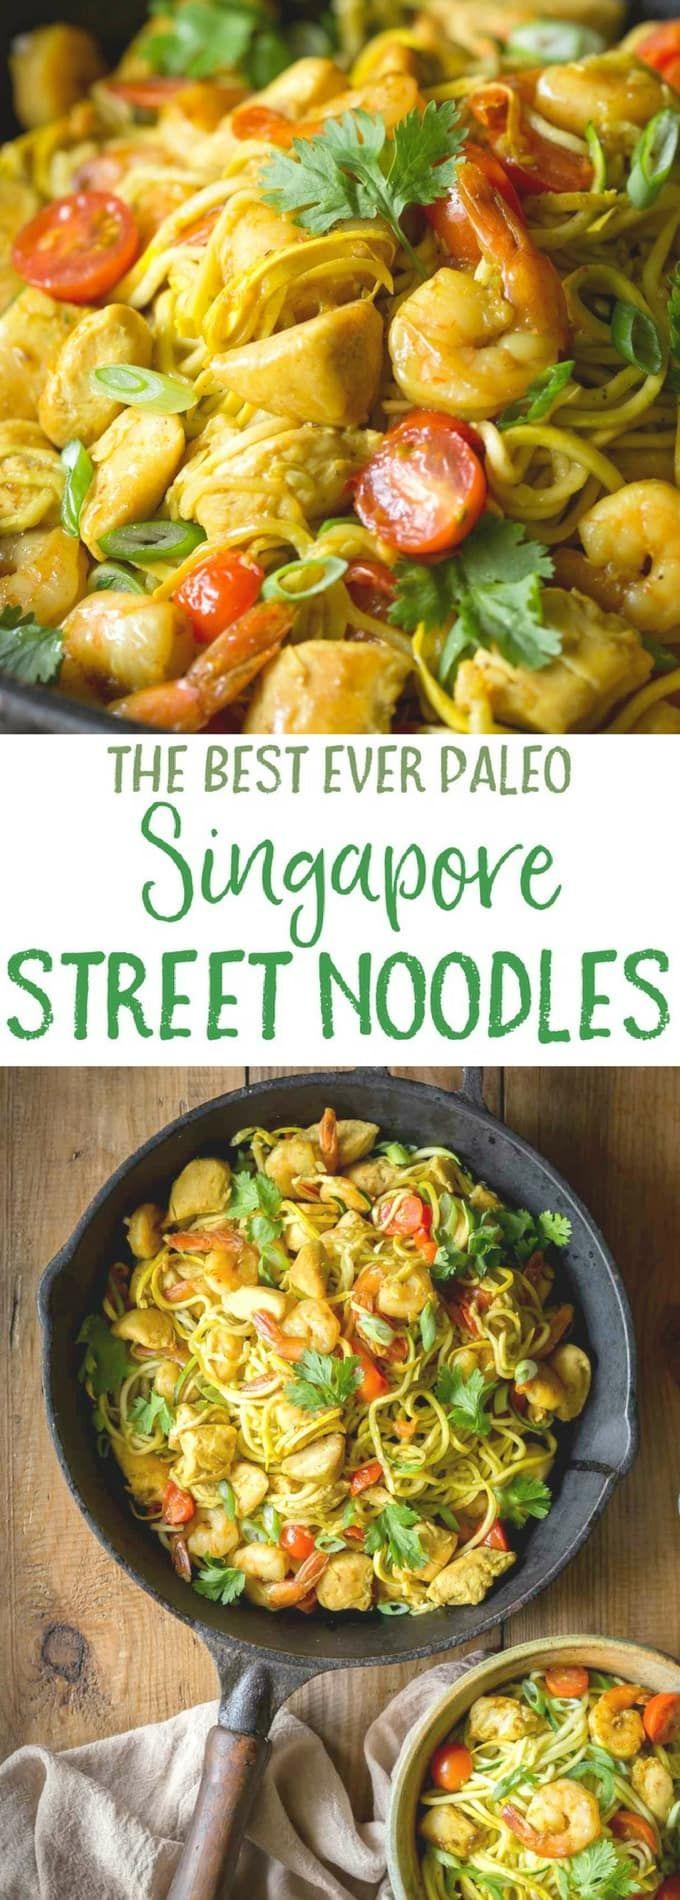 Paleo Singapore Street Noodles – Dan330